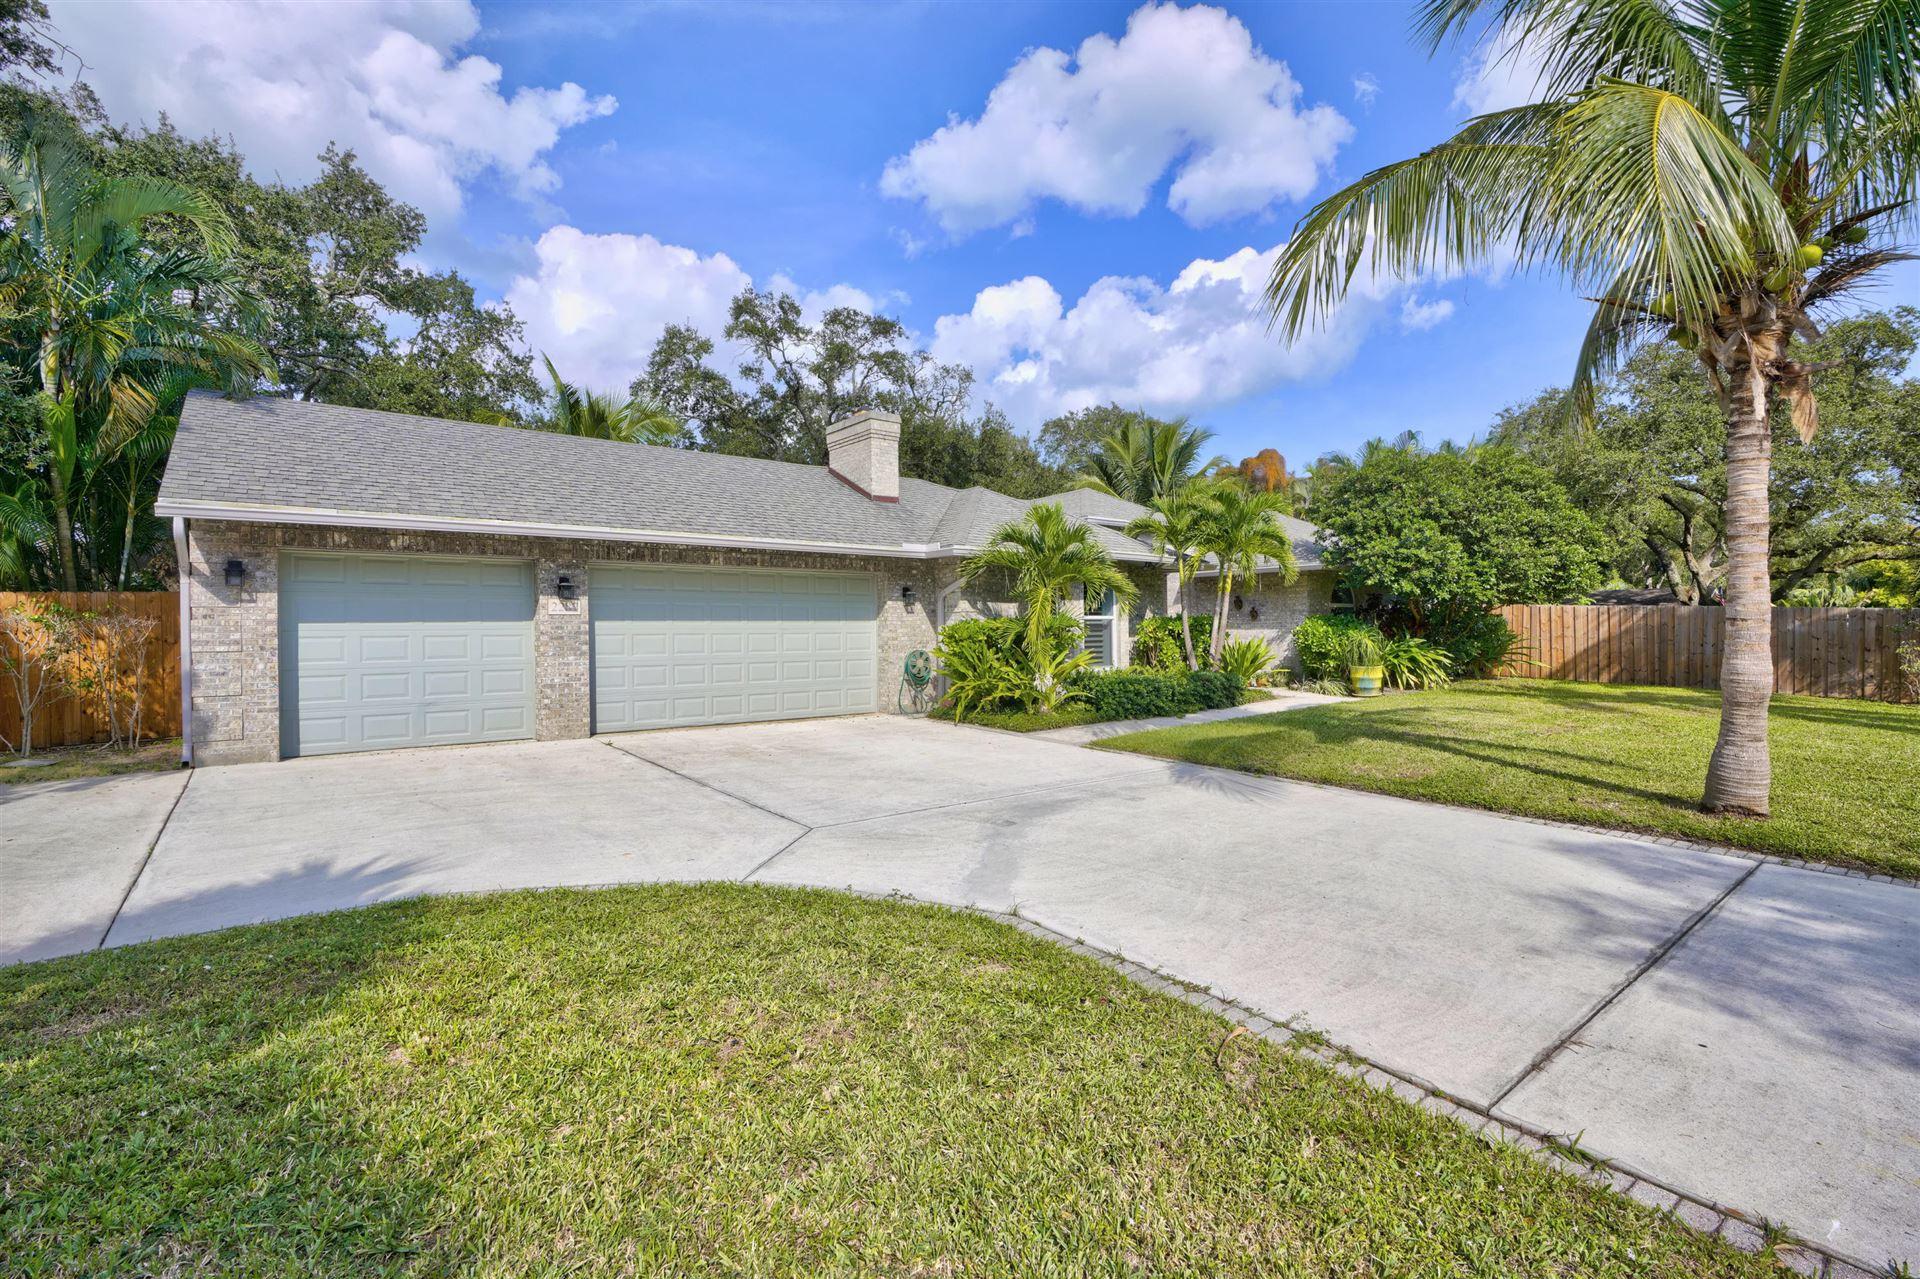 2287 Flamingo Road, Palm Beach Gardens, FL 33410 - #: RX-10657875